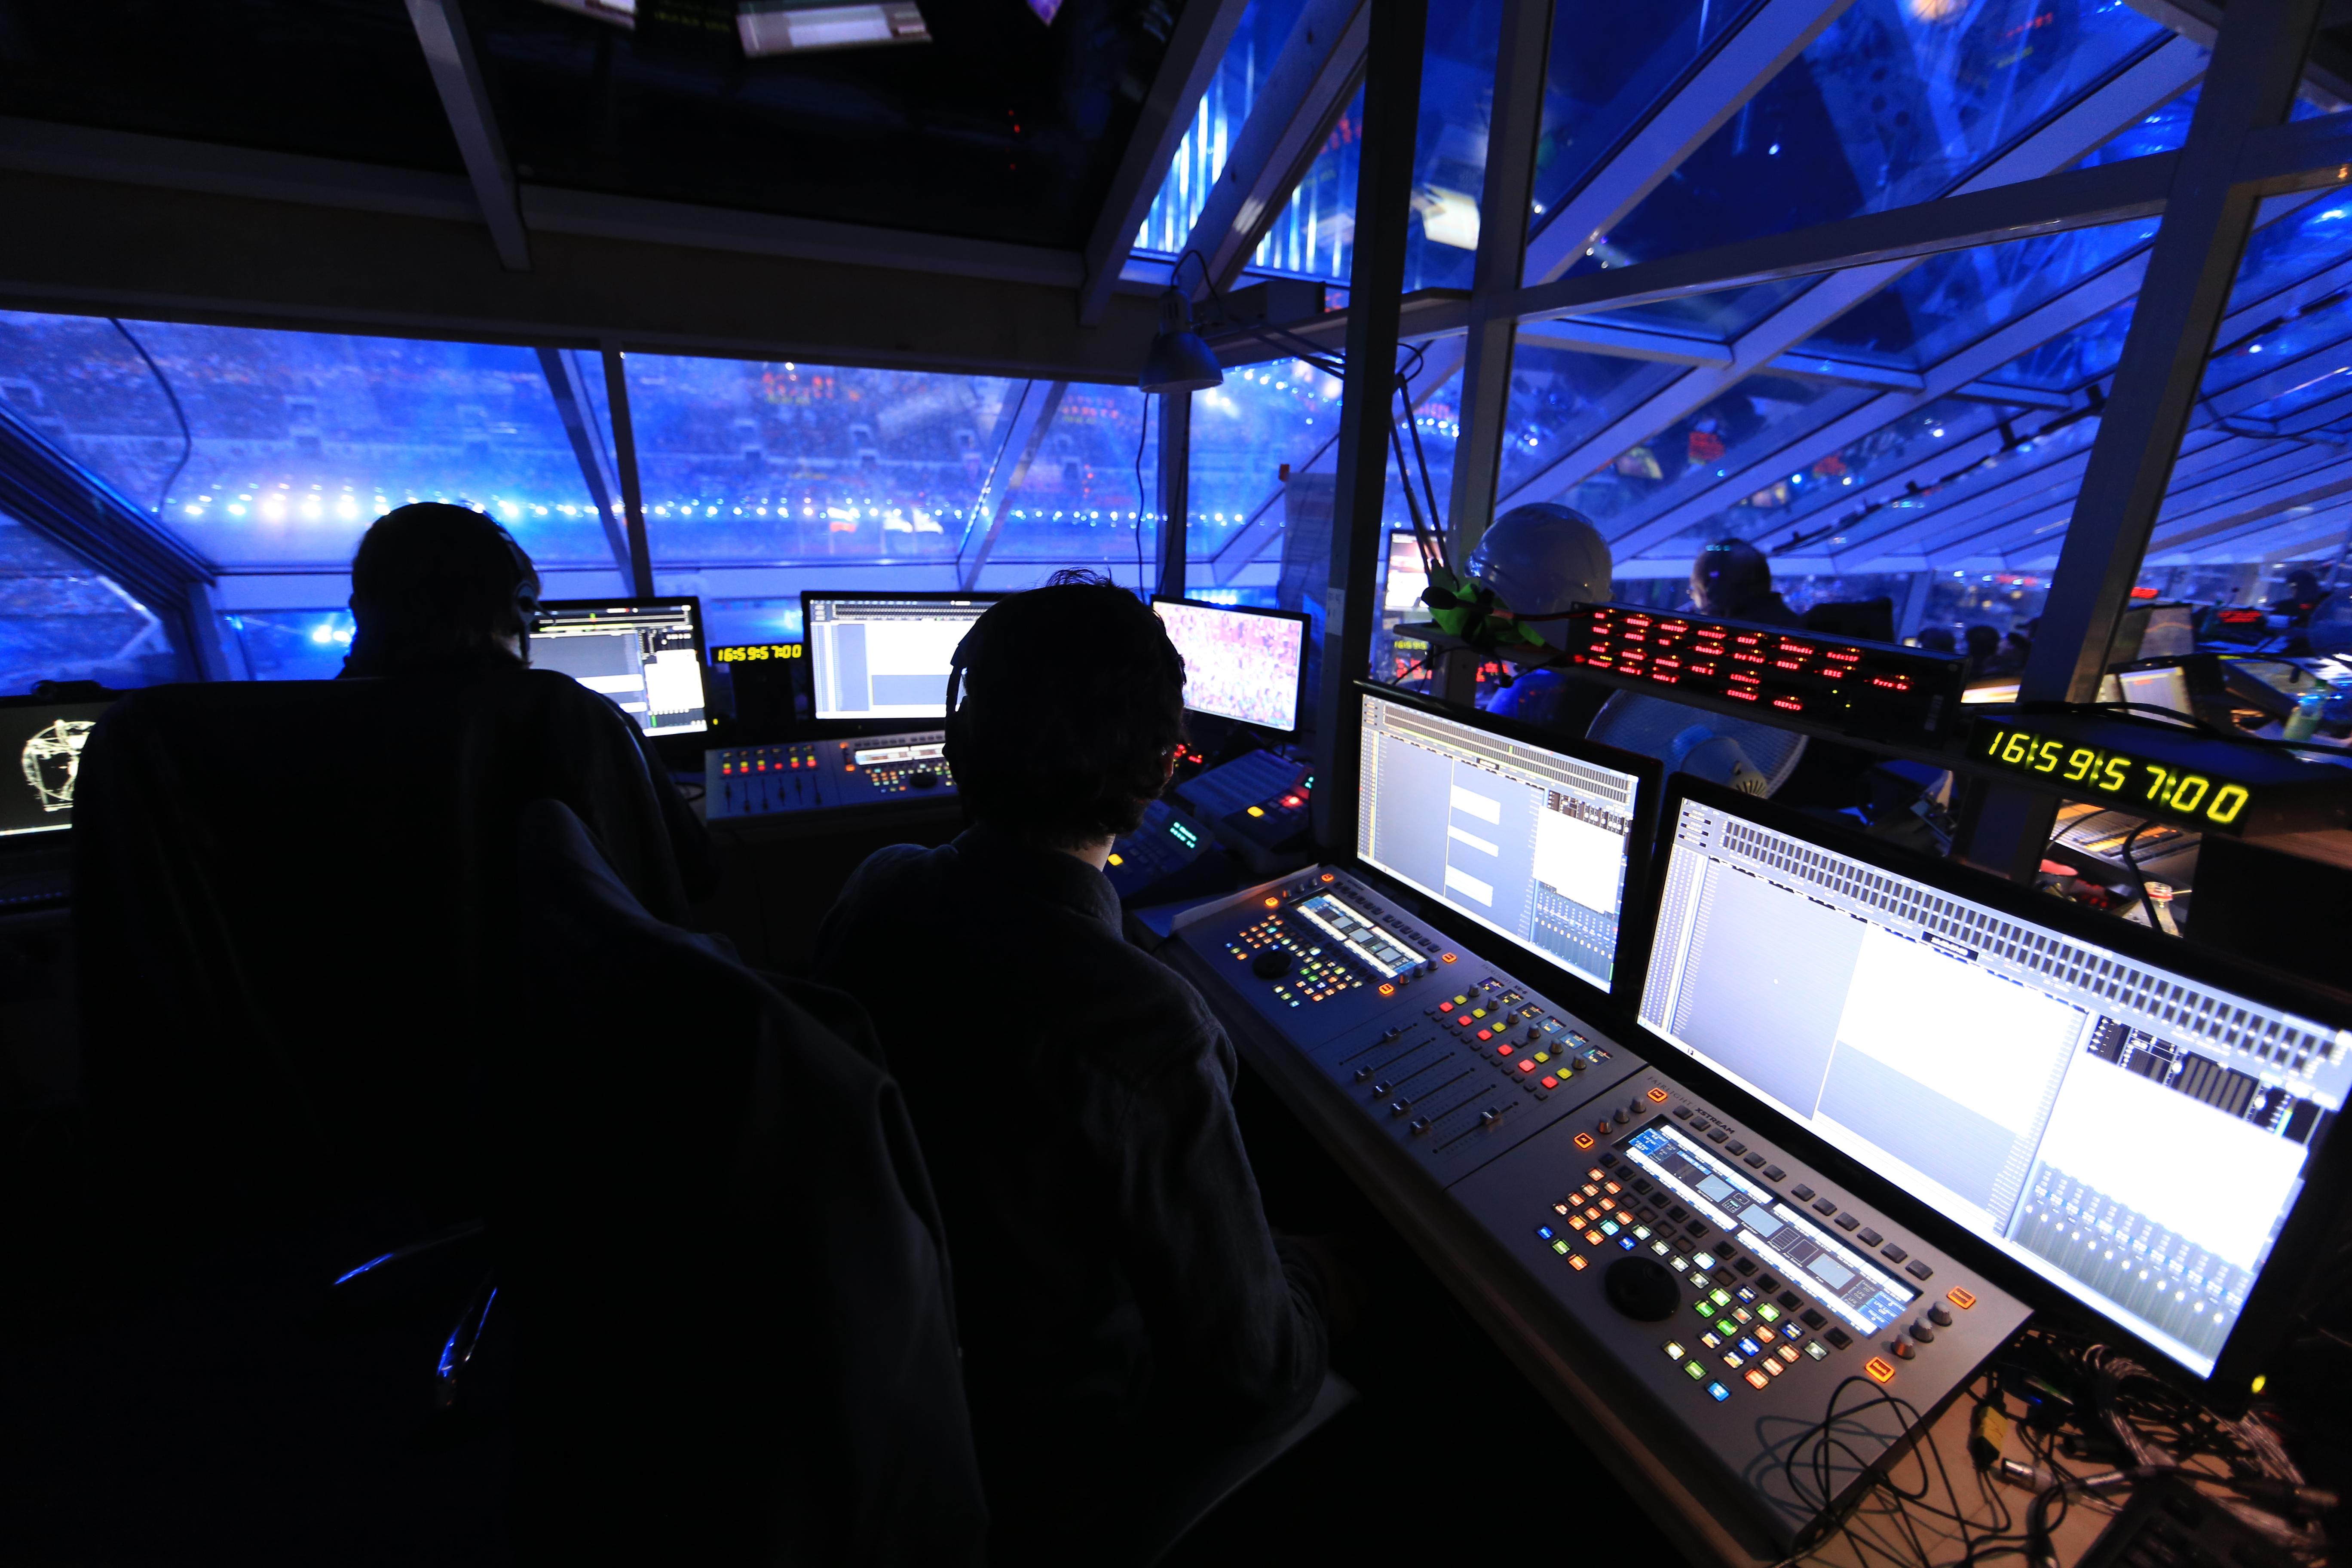 Sochi replay room